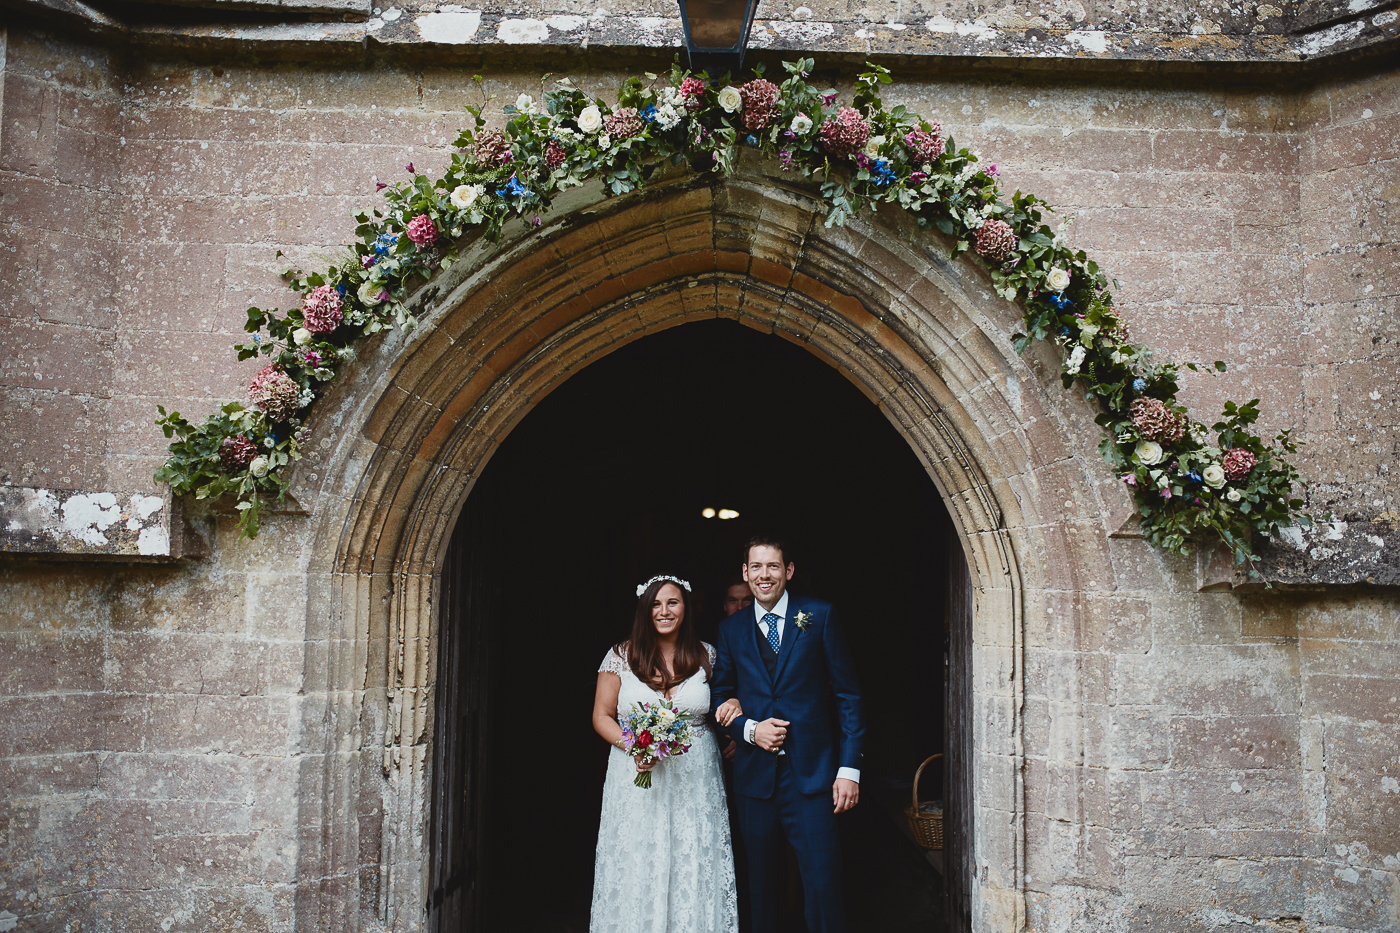 Danni_And_Jack_Gloucester_Wedding-75.jpg